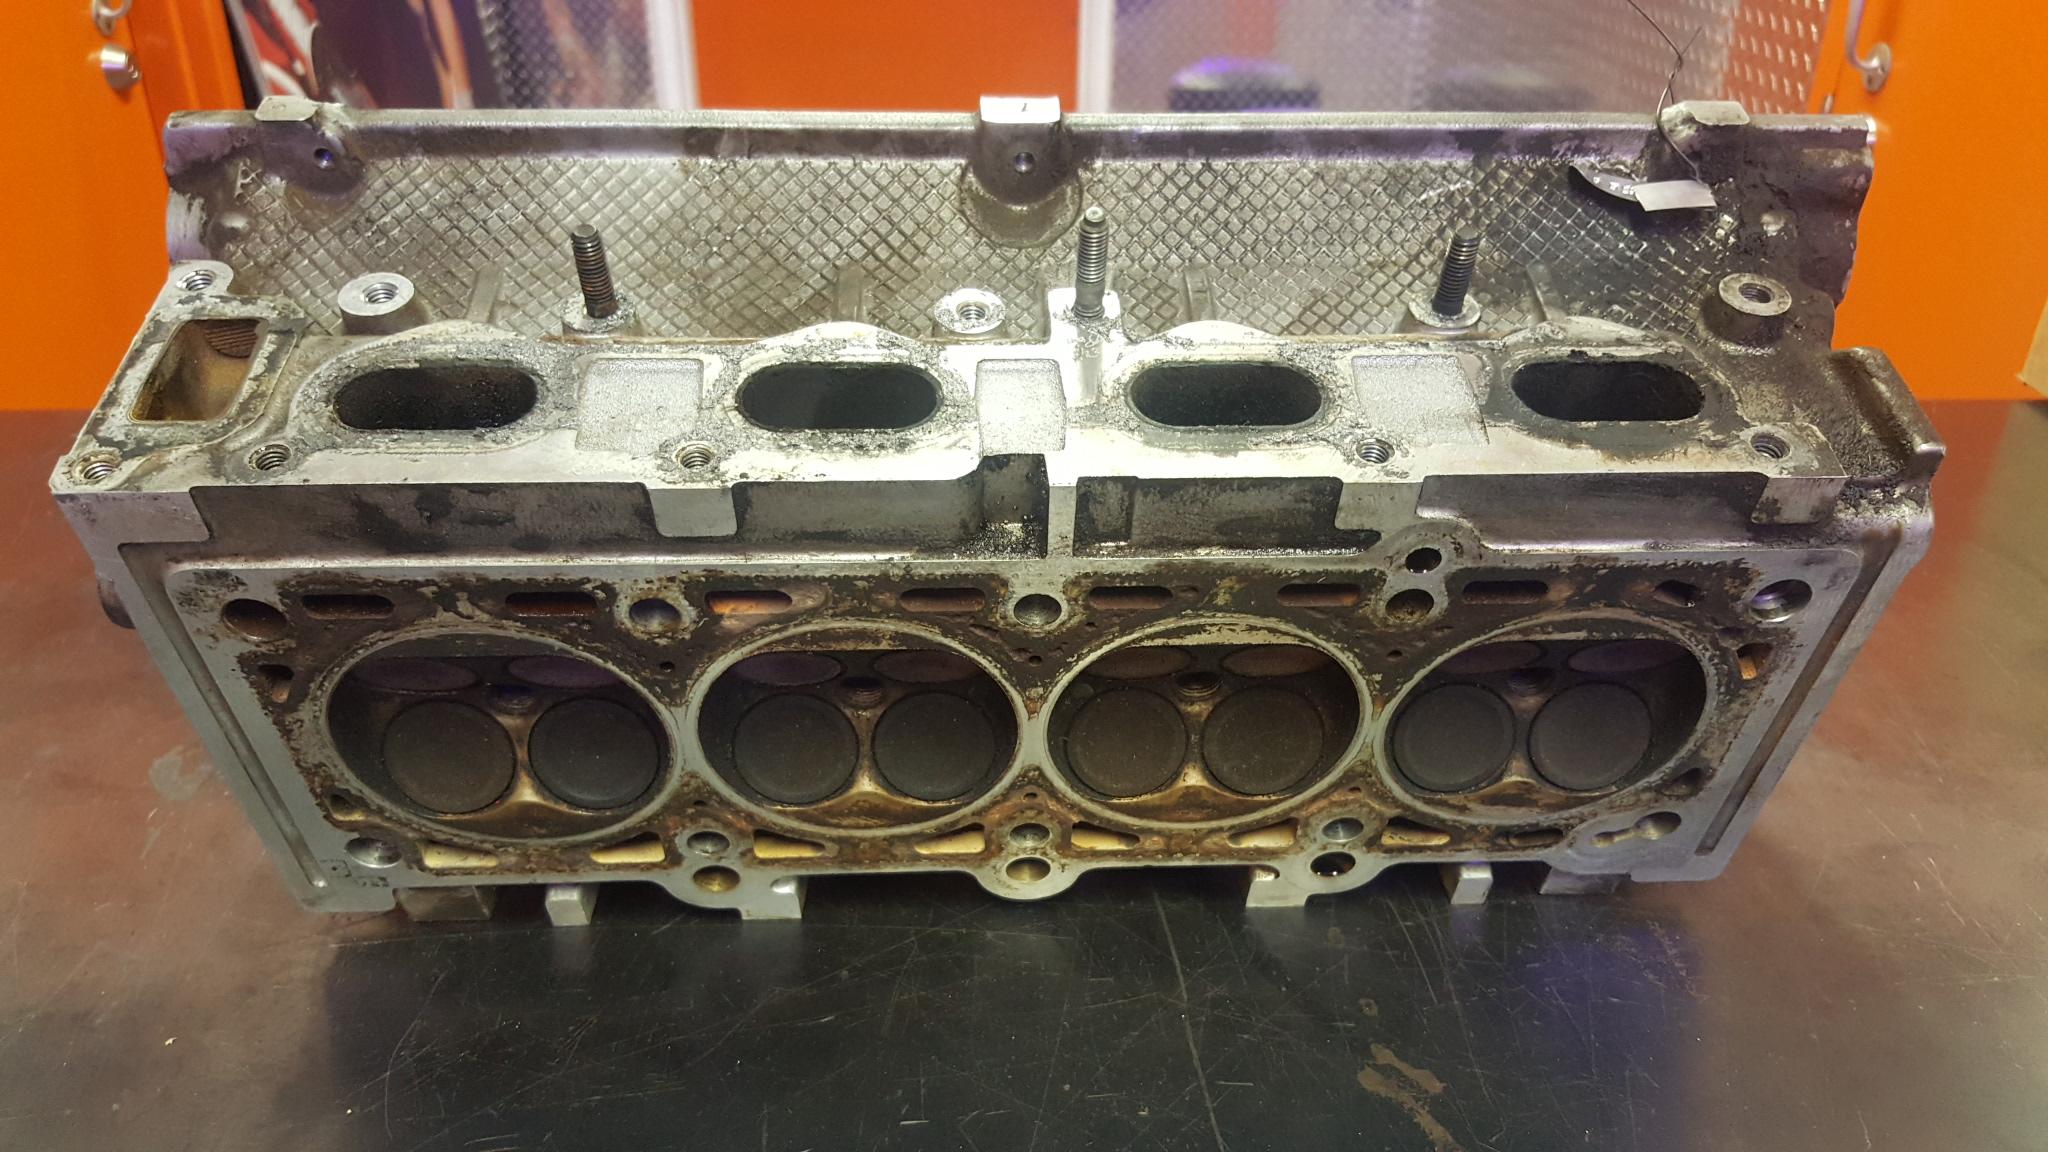 Mitsubishi Eclipse Chrysler 2 0 420A Cylinder Head Machining - Motor